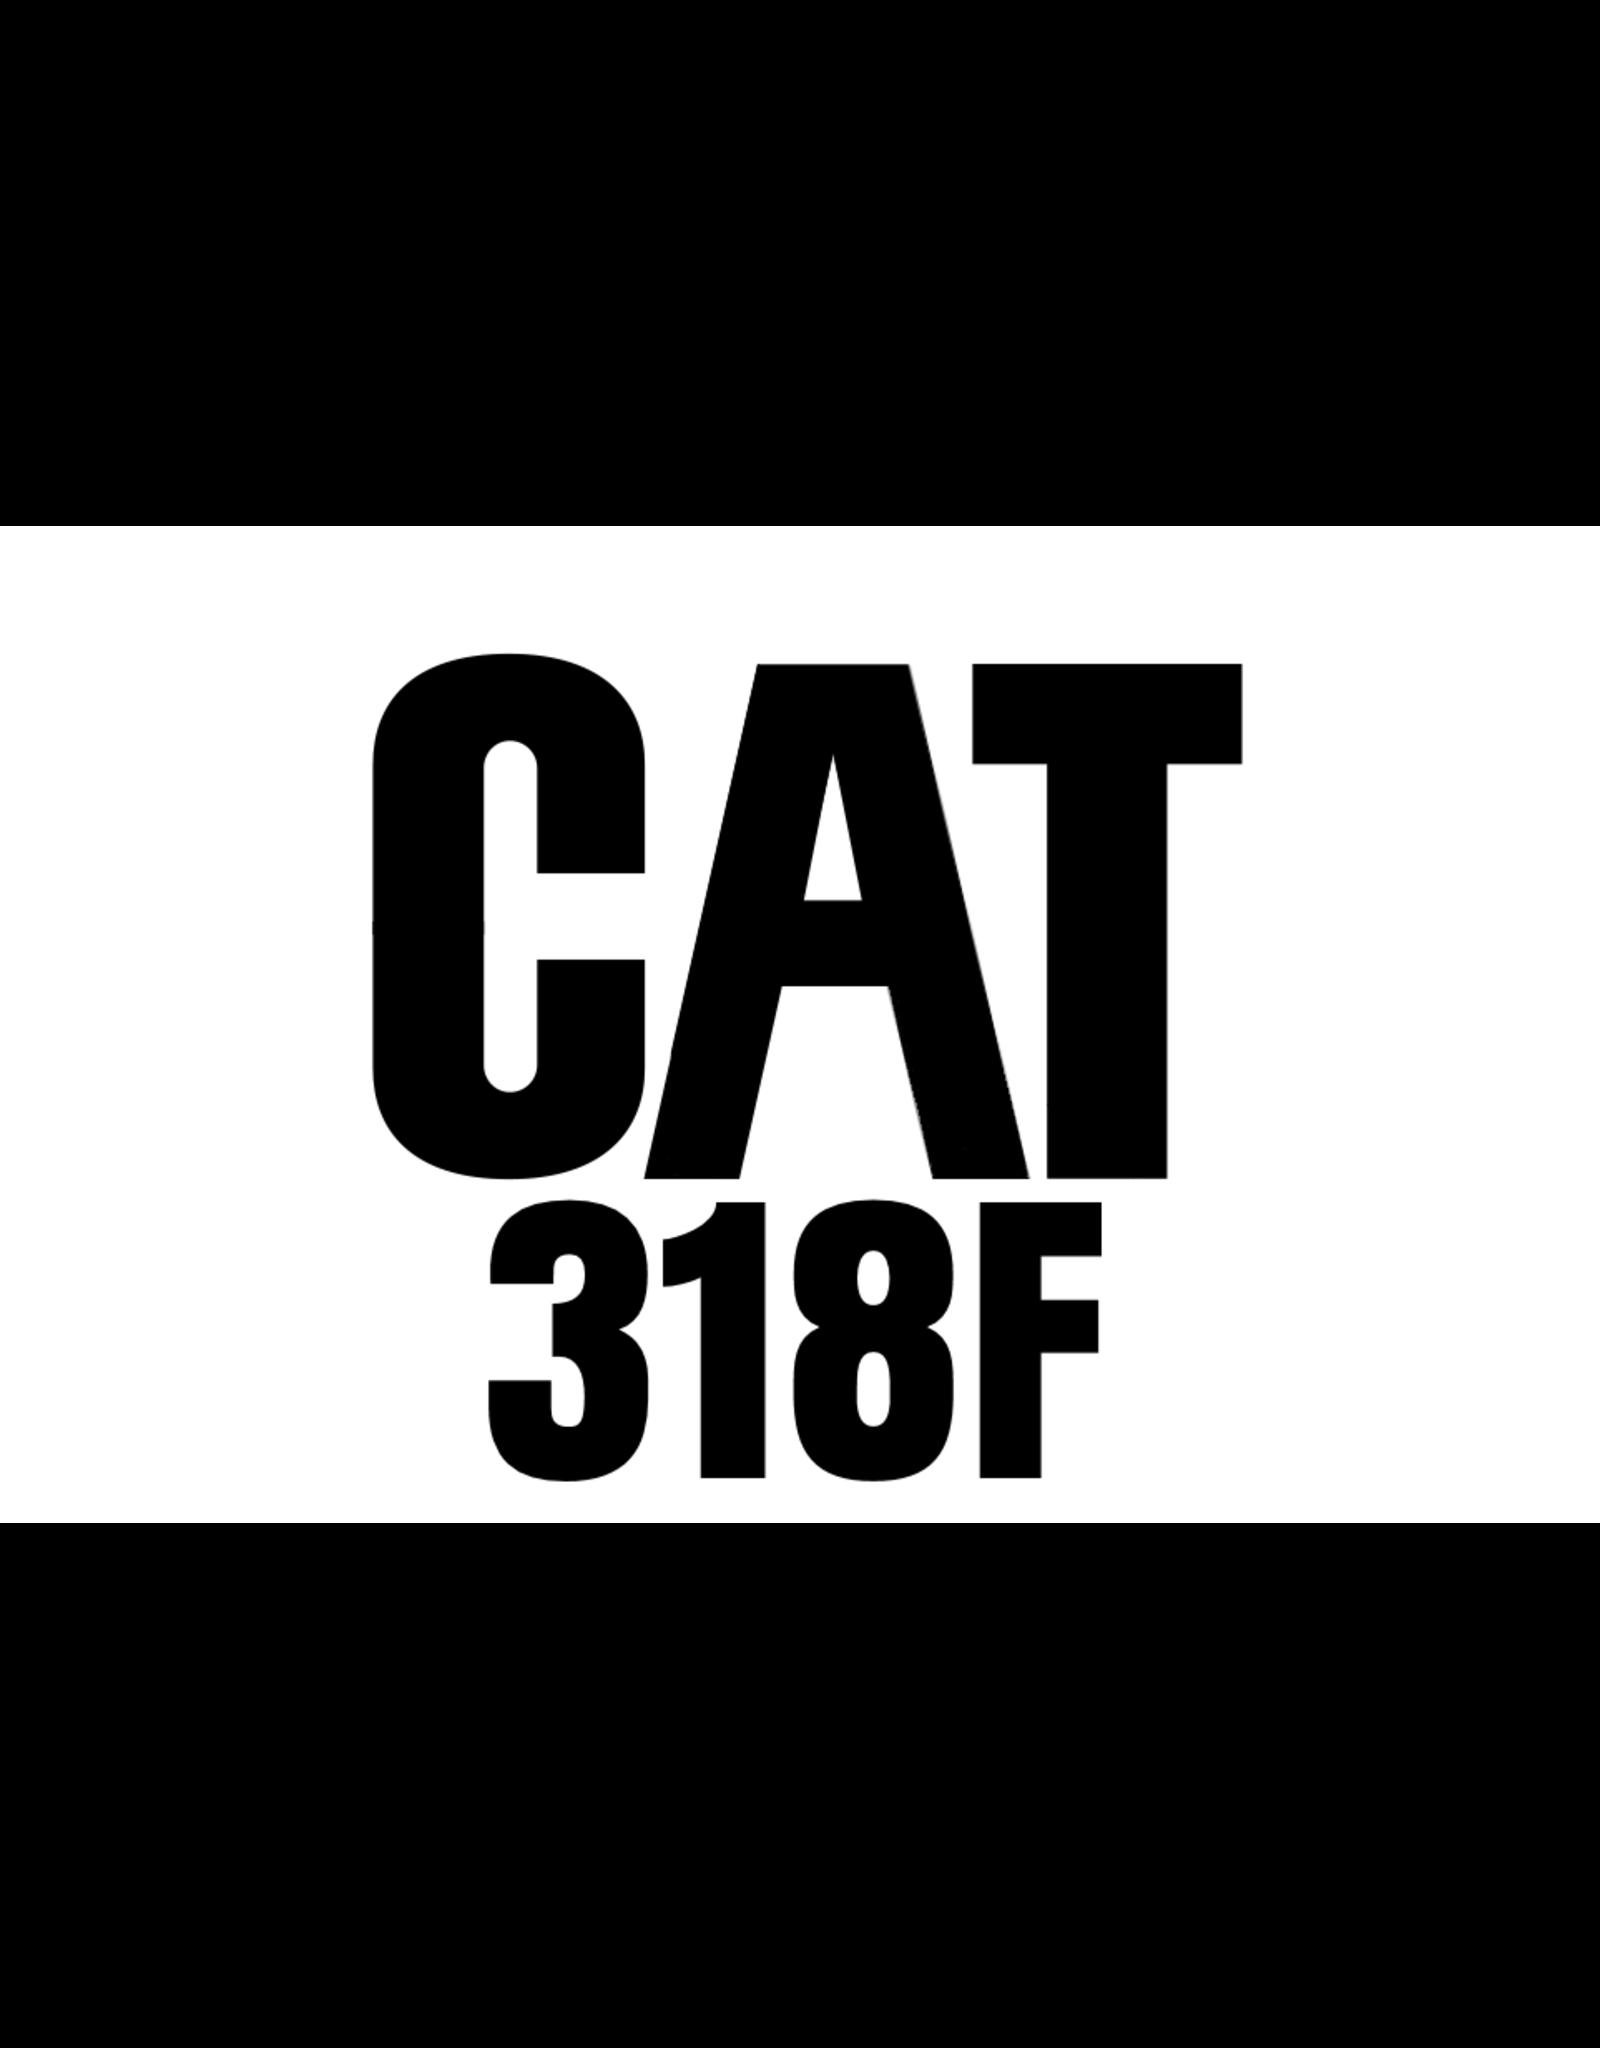 Echle Hartstahl GmbH FOPS for CAT 318F